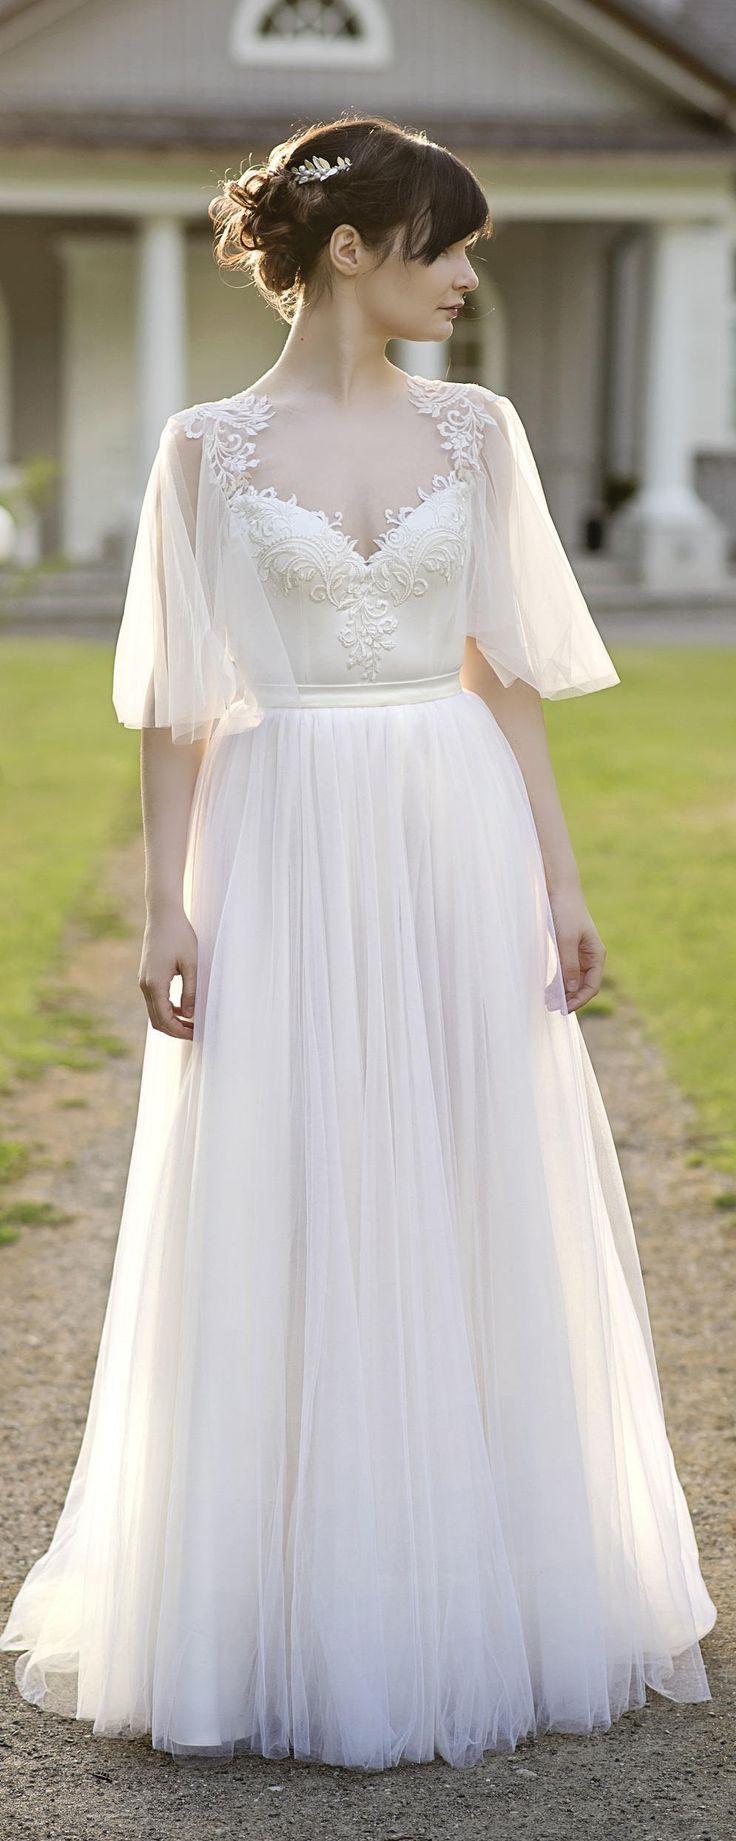 Grace – bohemian wedding dress / wedding dress / open back wedding dress / two piece wedding dress / flutter sleeve wedding dress